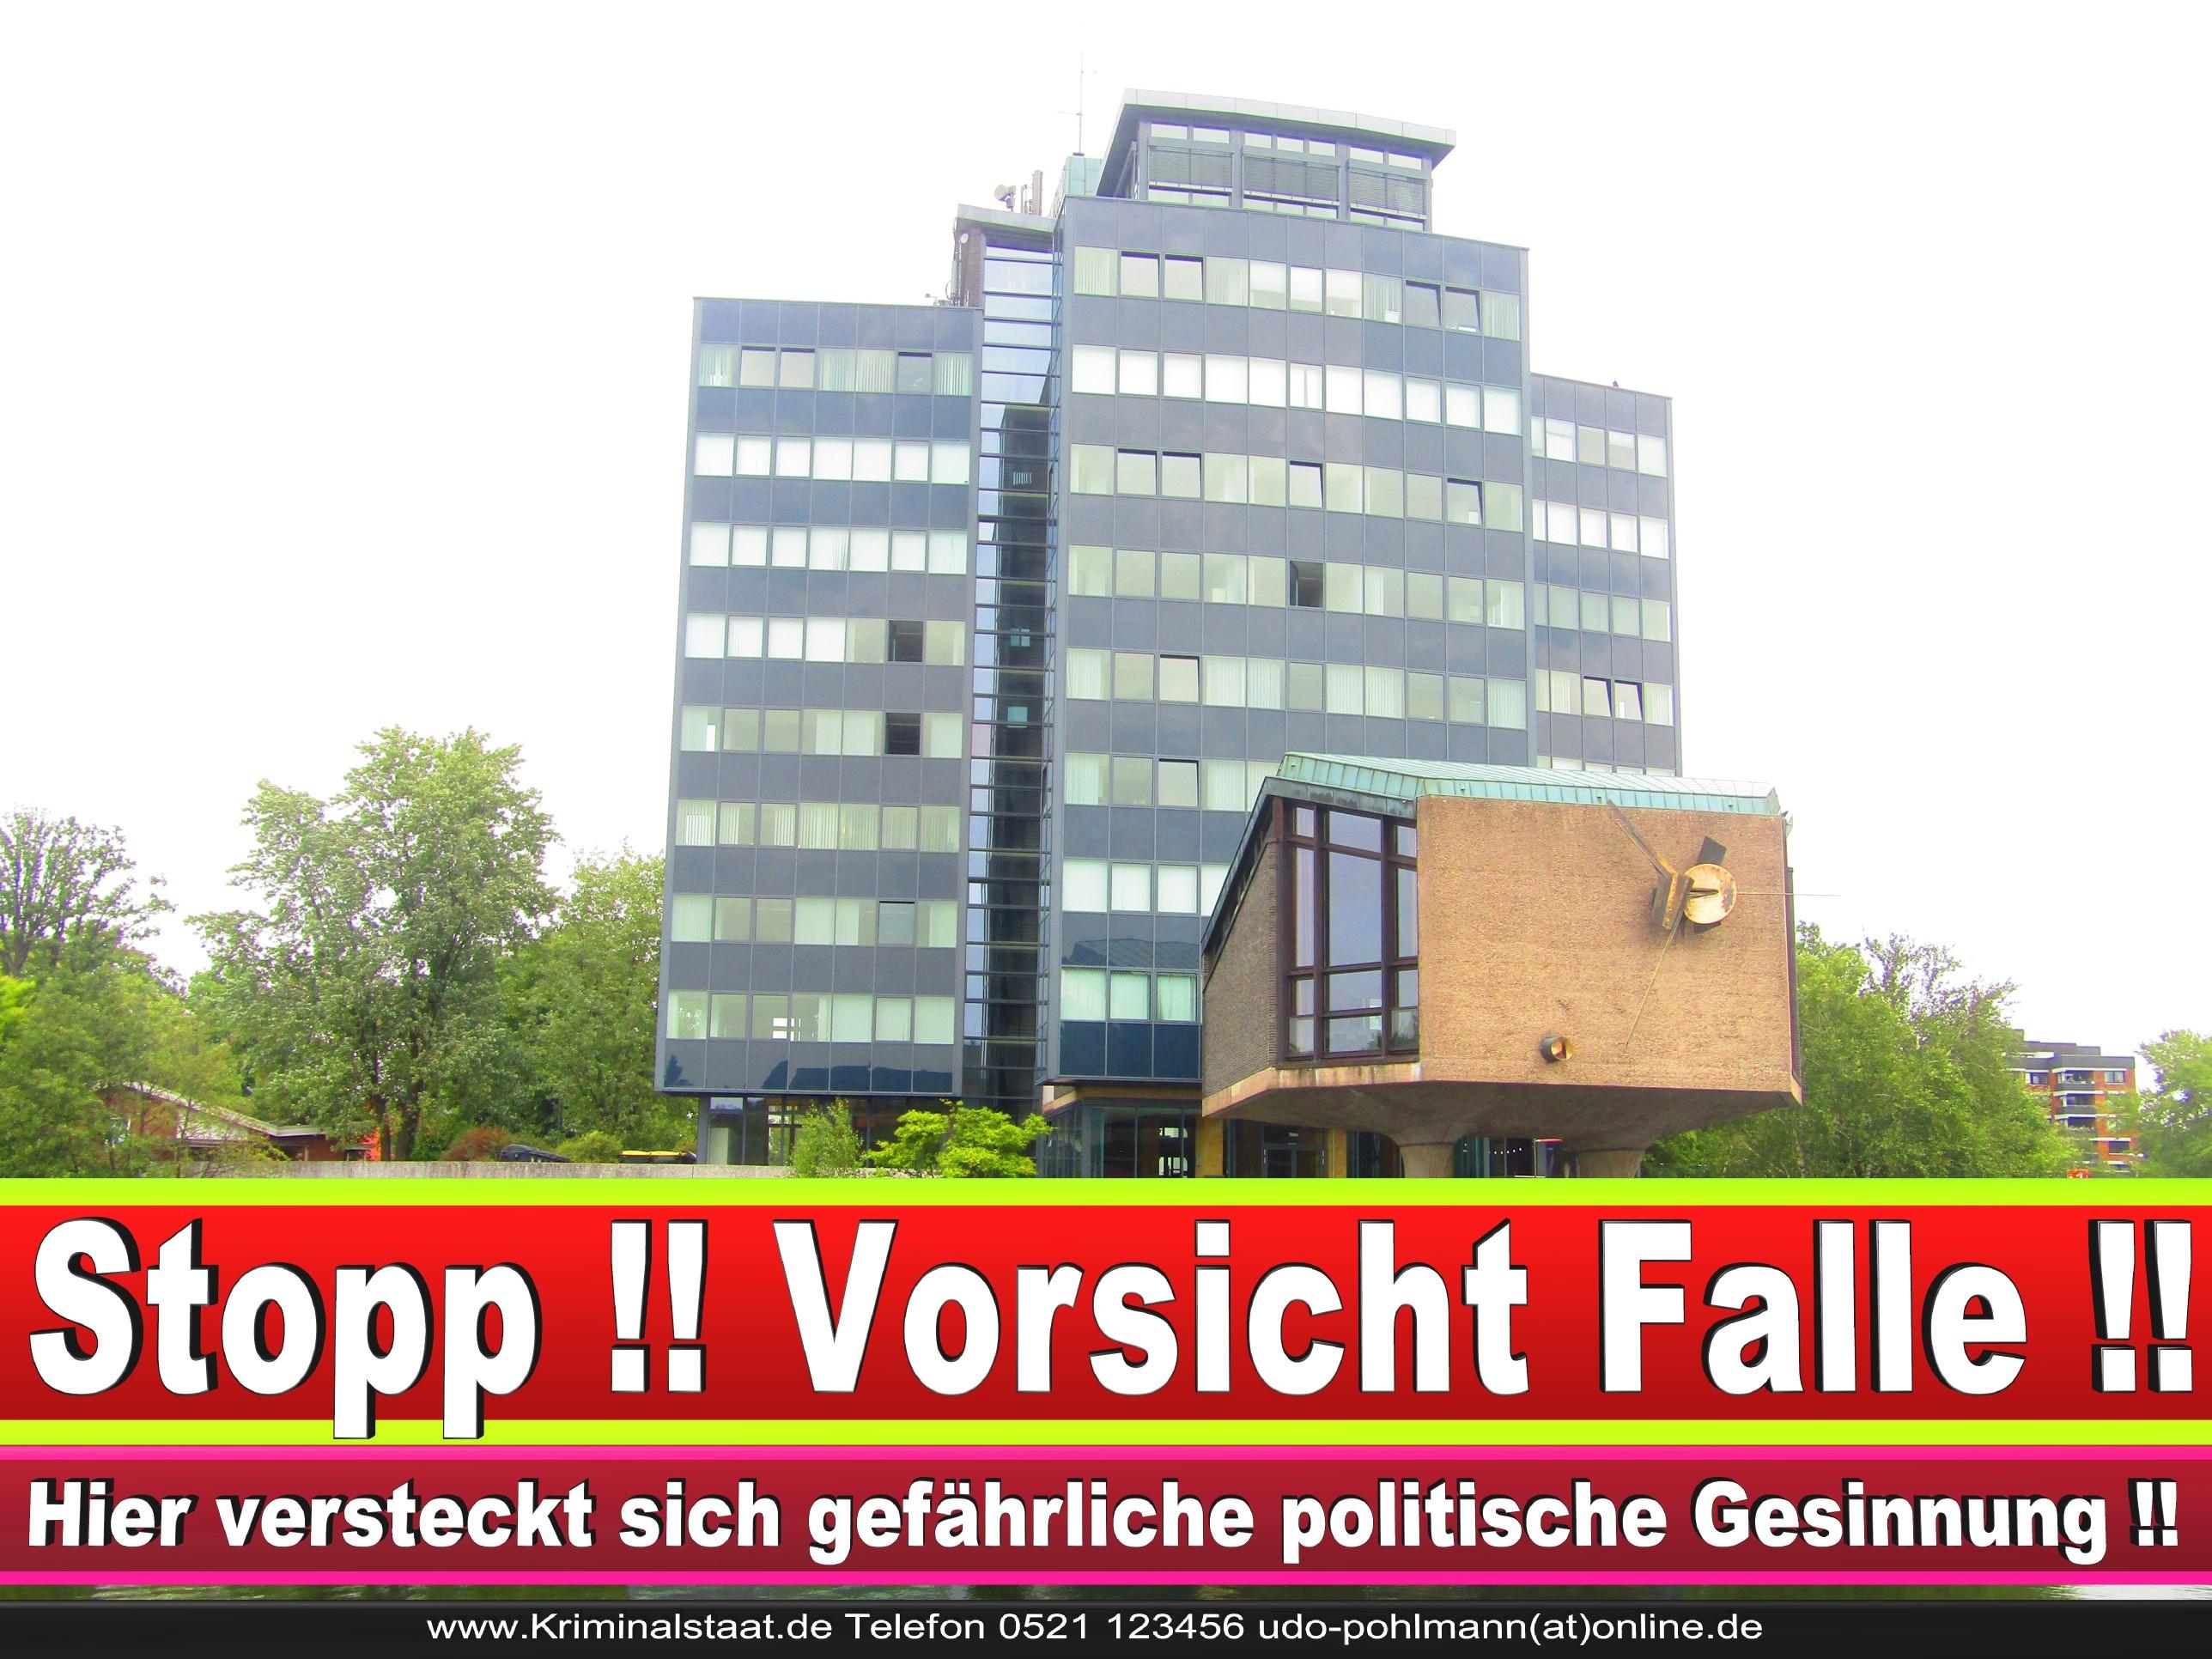 SENNESTADTVEREIN CDU BIELEFELD 8 LANDTAGSWAHL BUNDESTAGSWAHL BÜRGERMEISTERWAHL